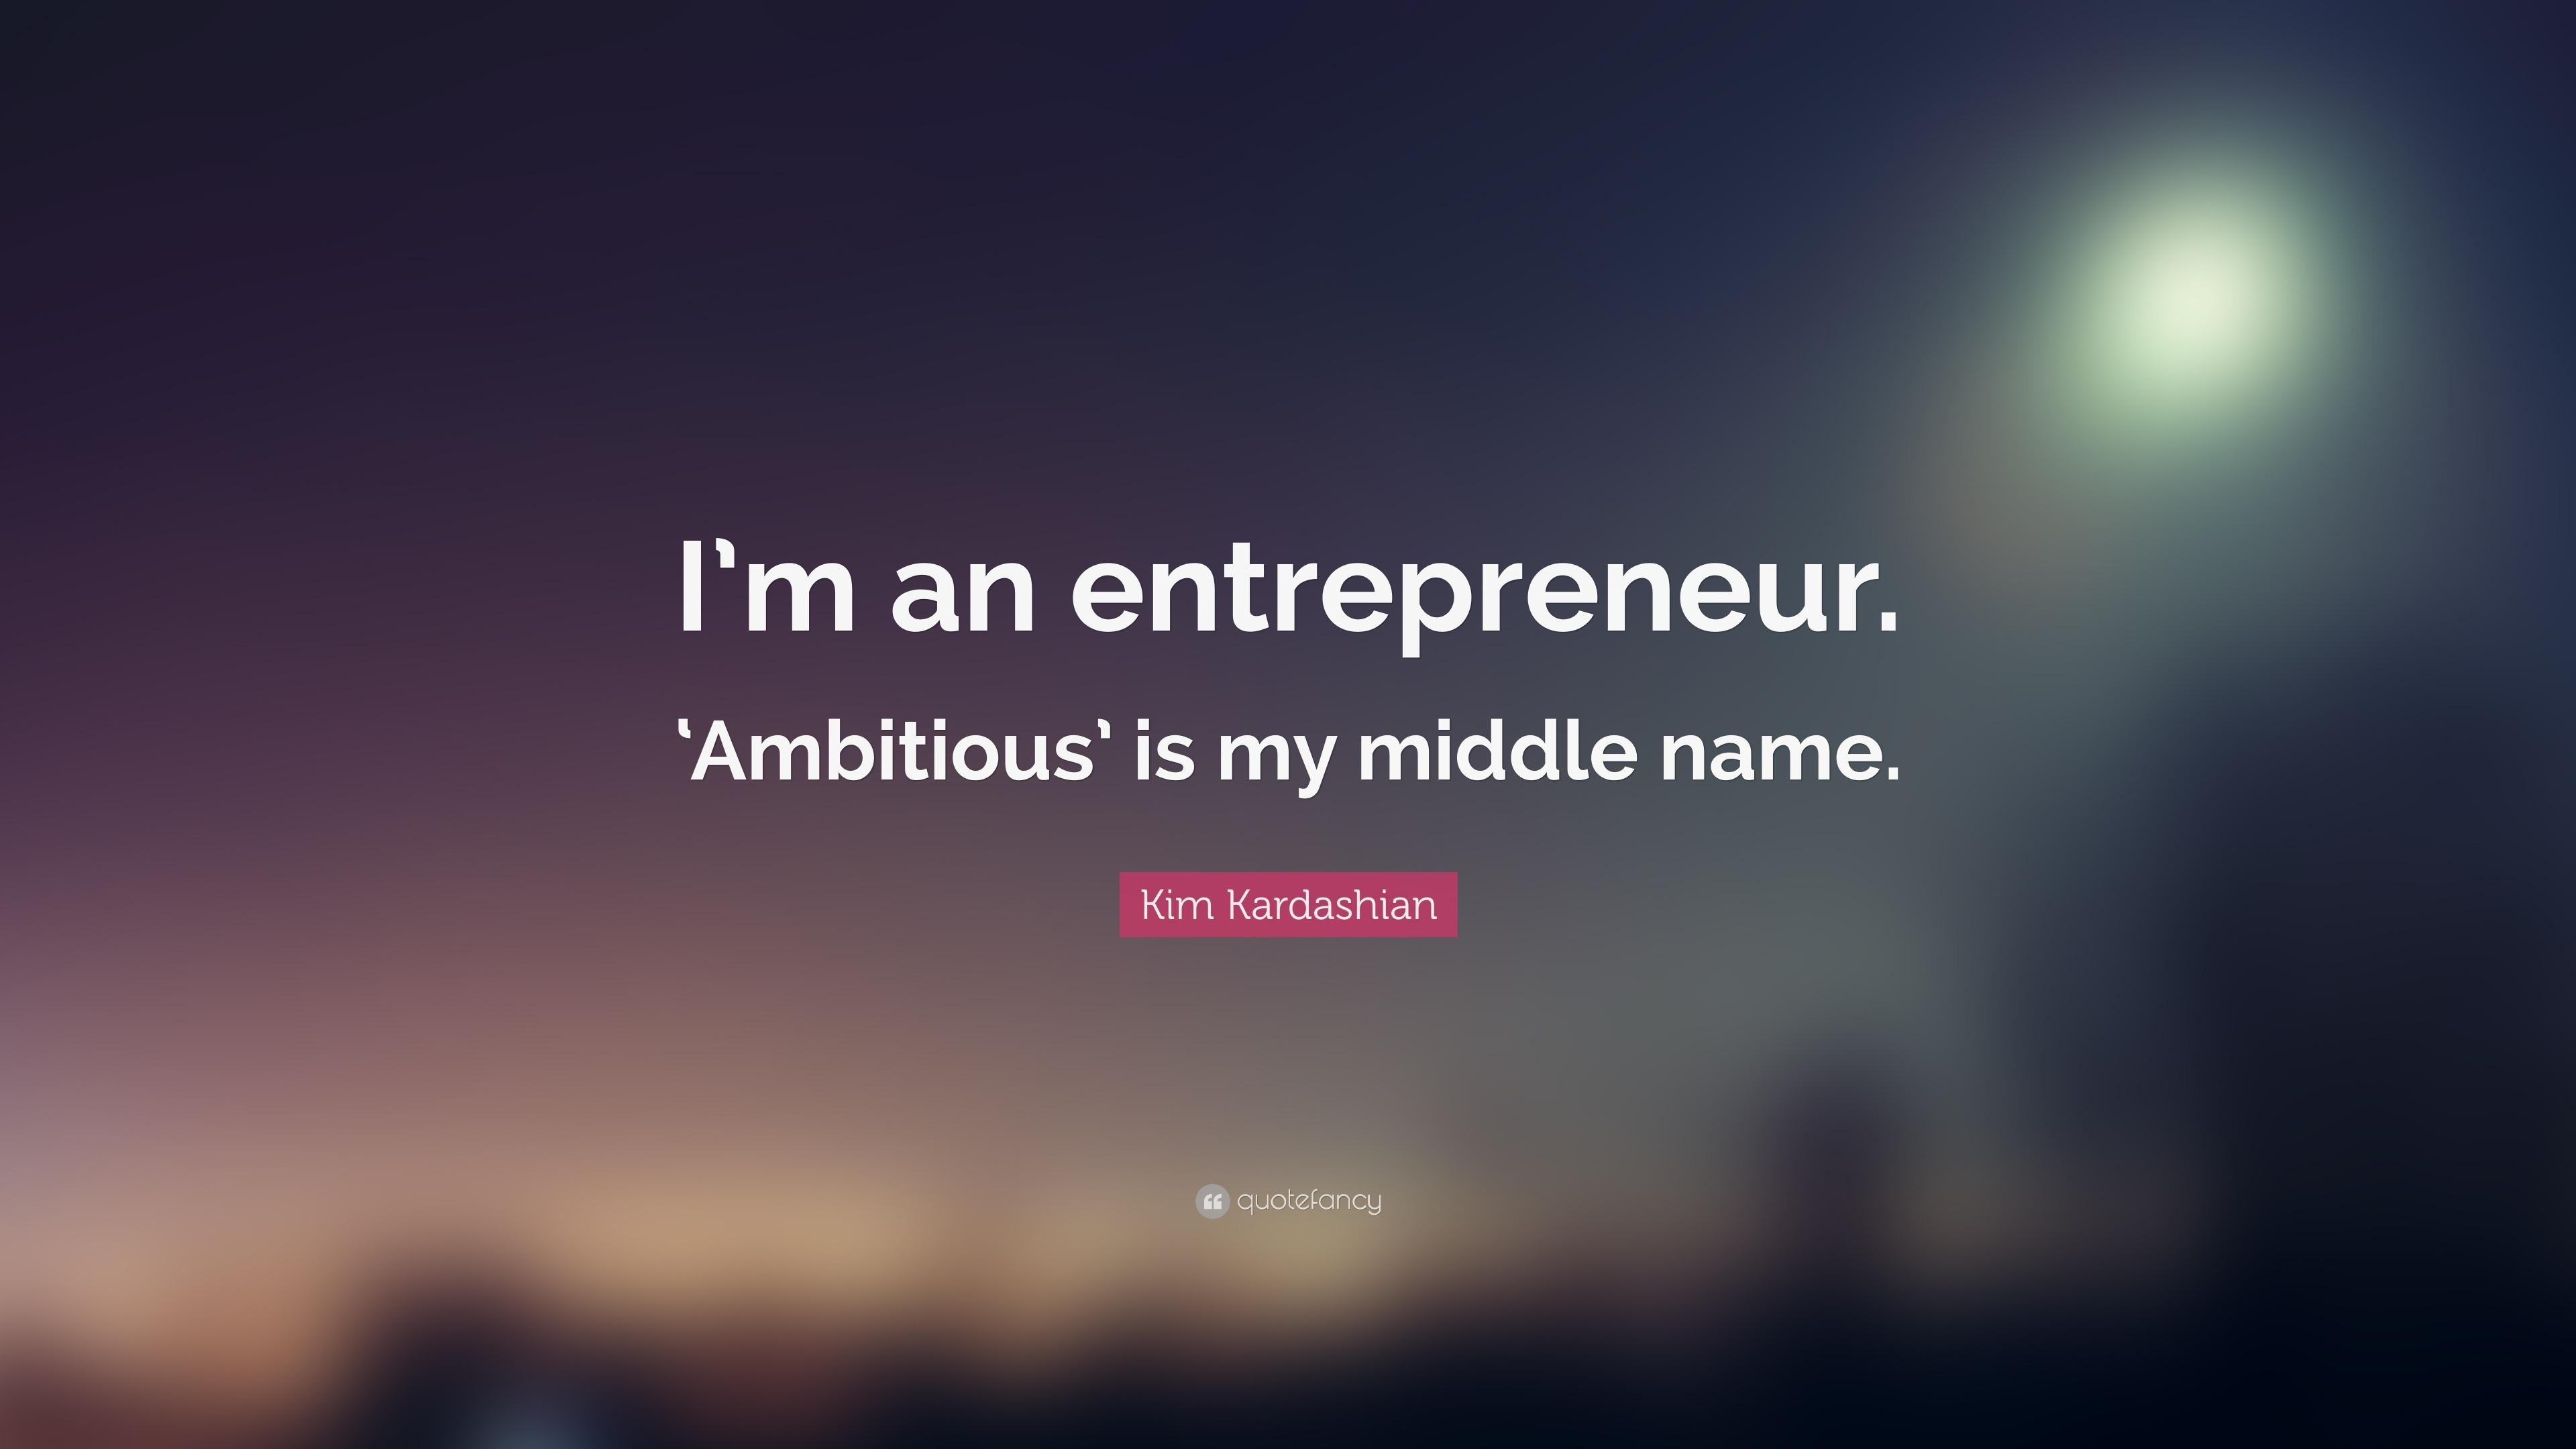 Kim kardashian quote i m an entrepreneur ambitious is my middle name 9 wallpapers - Entrepreneur wallpaper ...